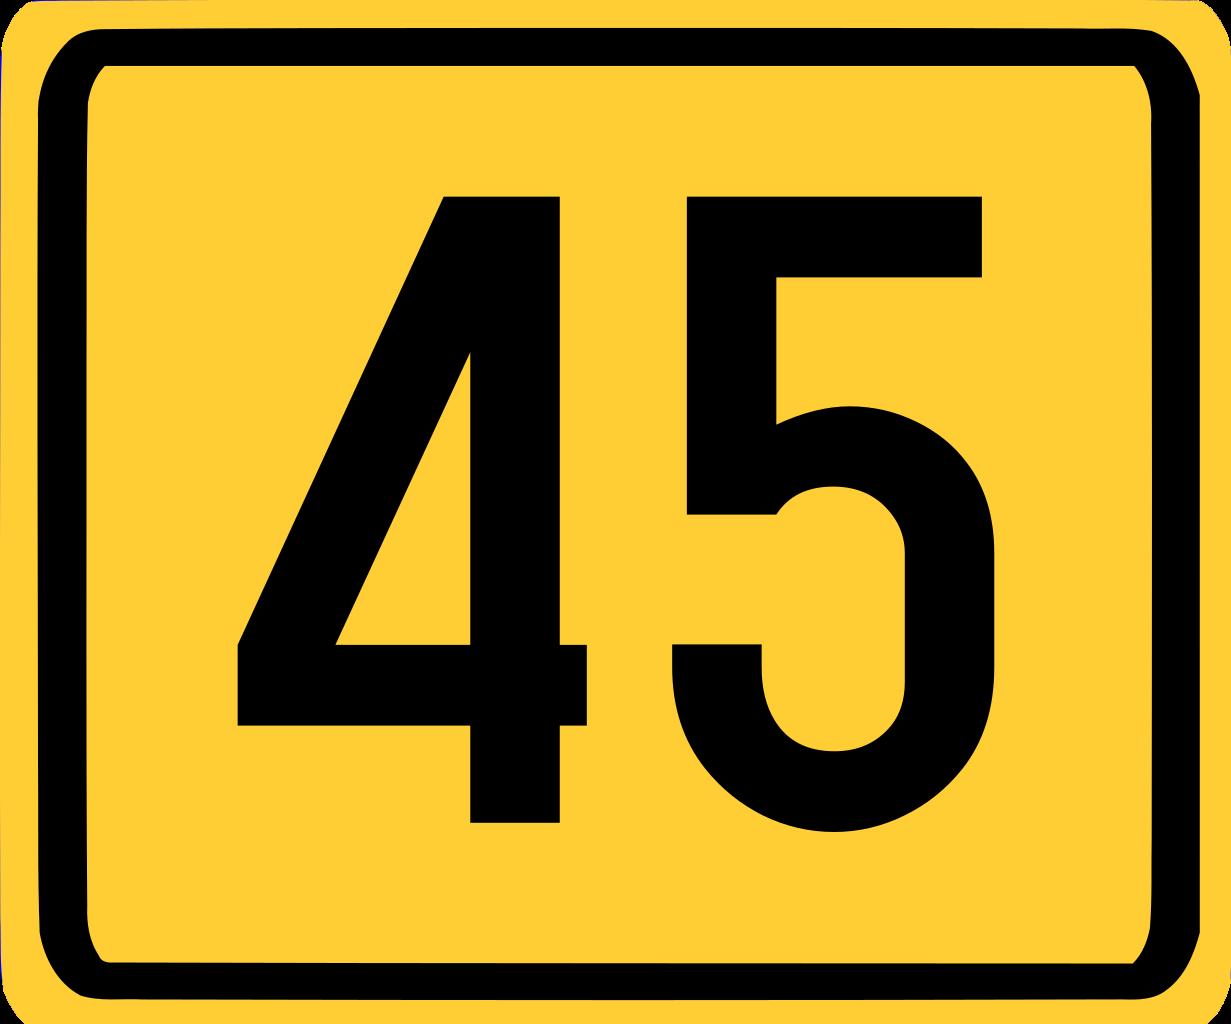 File:M45.